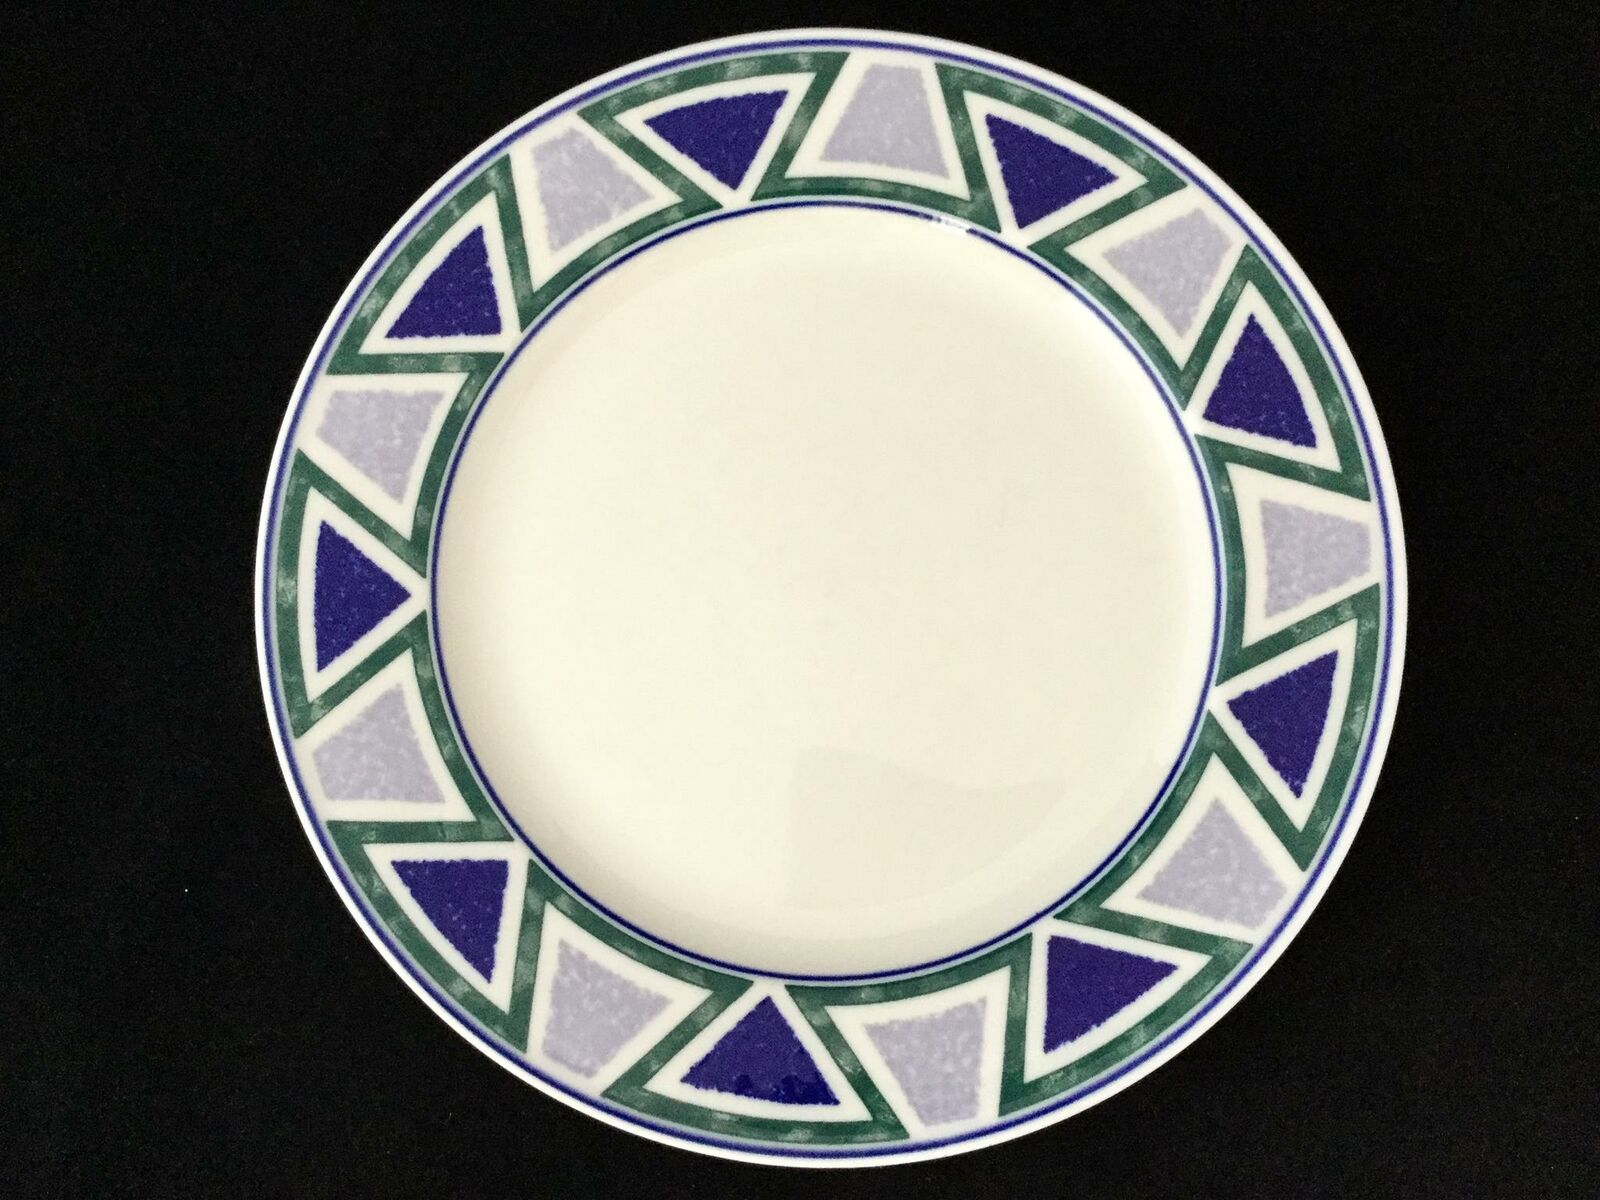 Set of 4 Studio Nova JJP01 VISTA 10 3 4  Blau Grün Dinner Plates- FREE SHIPPING